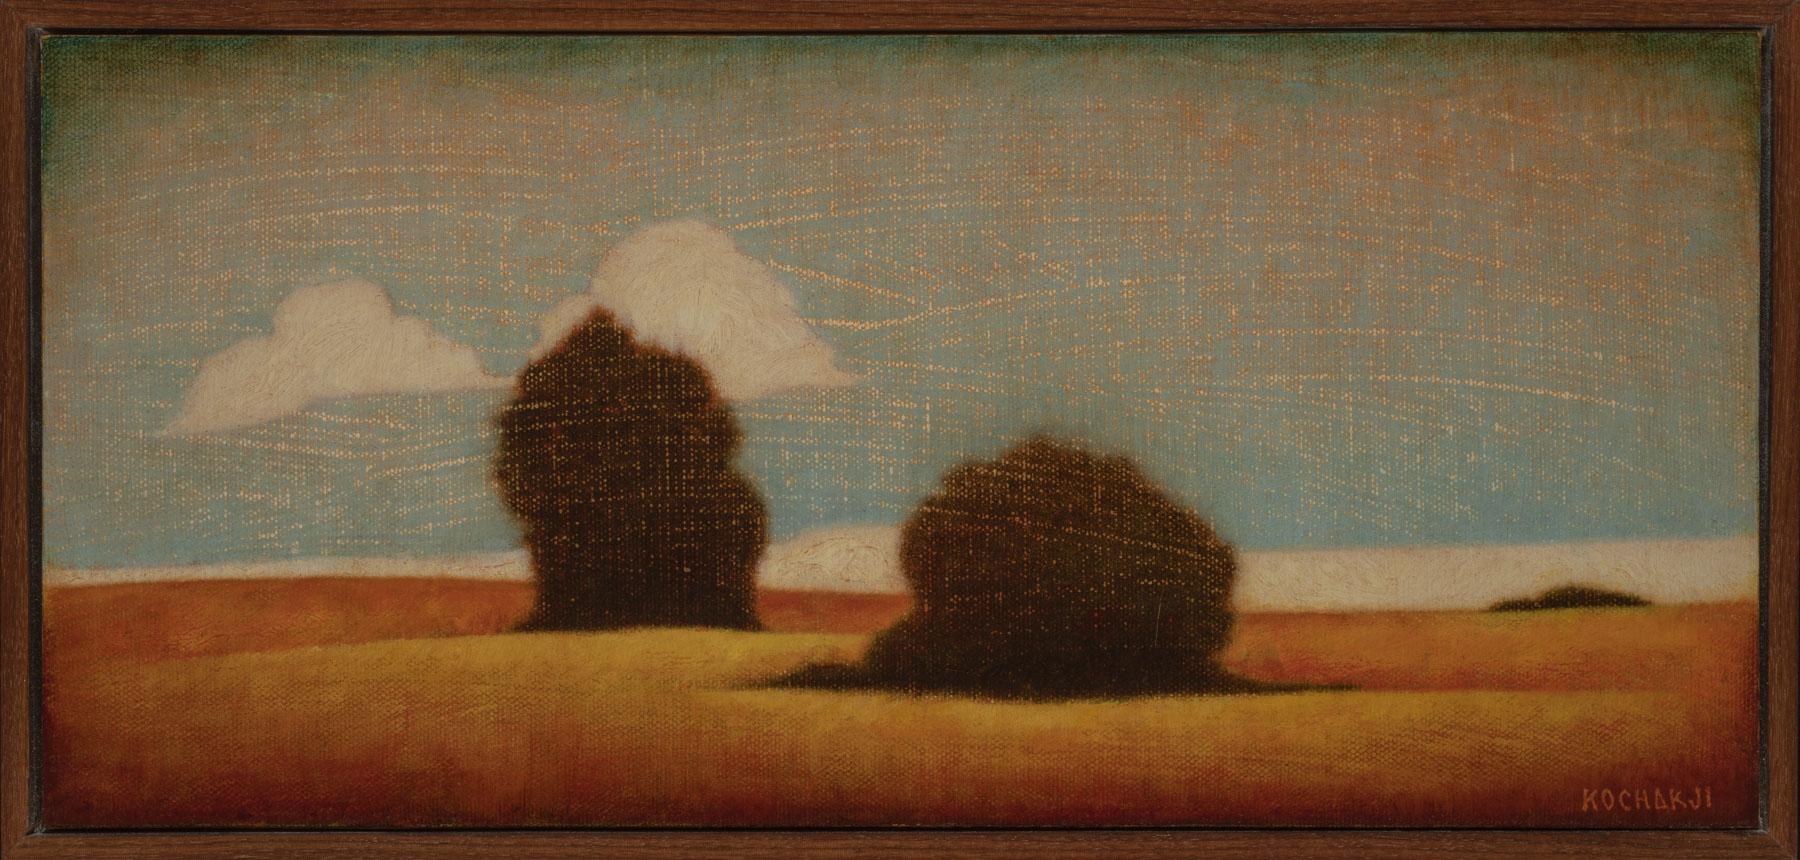 "Companion - oil on canvas - 15x7"" - TAG Gallery"